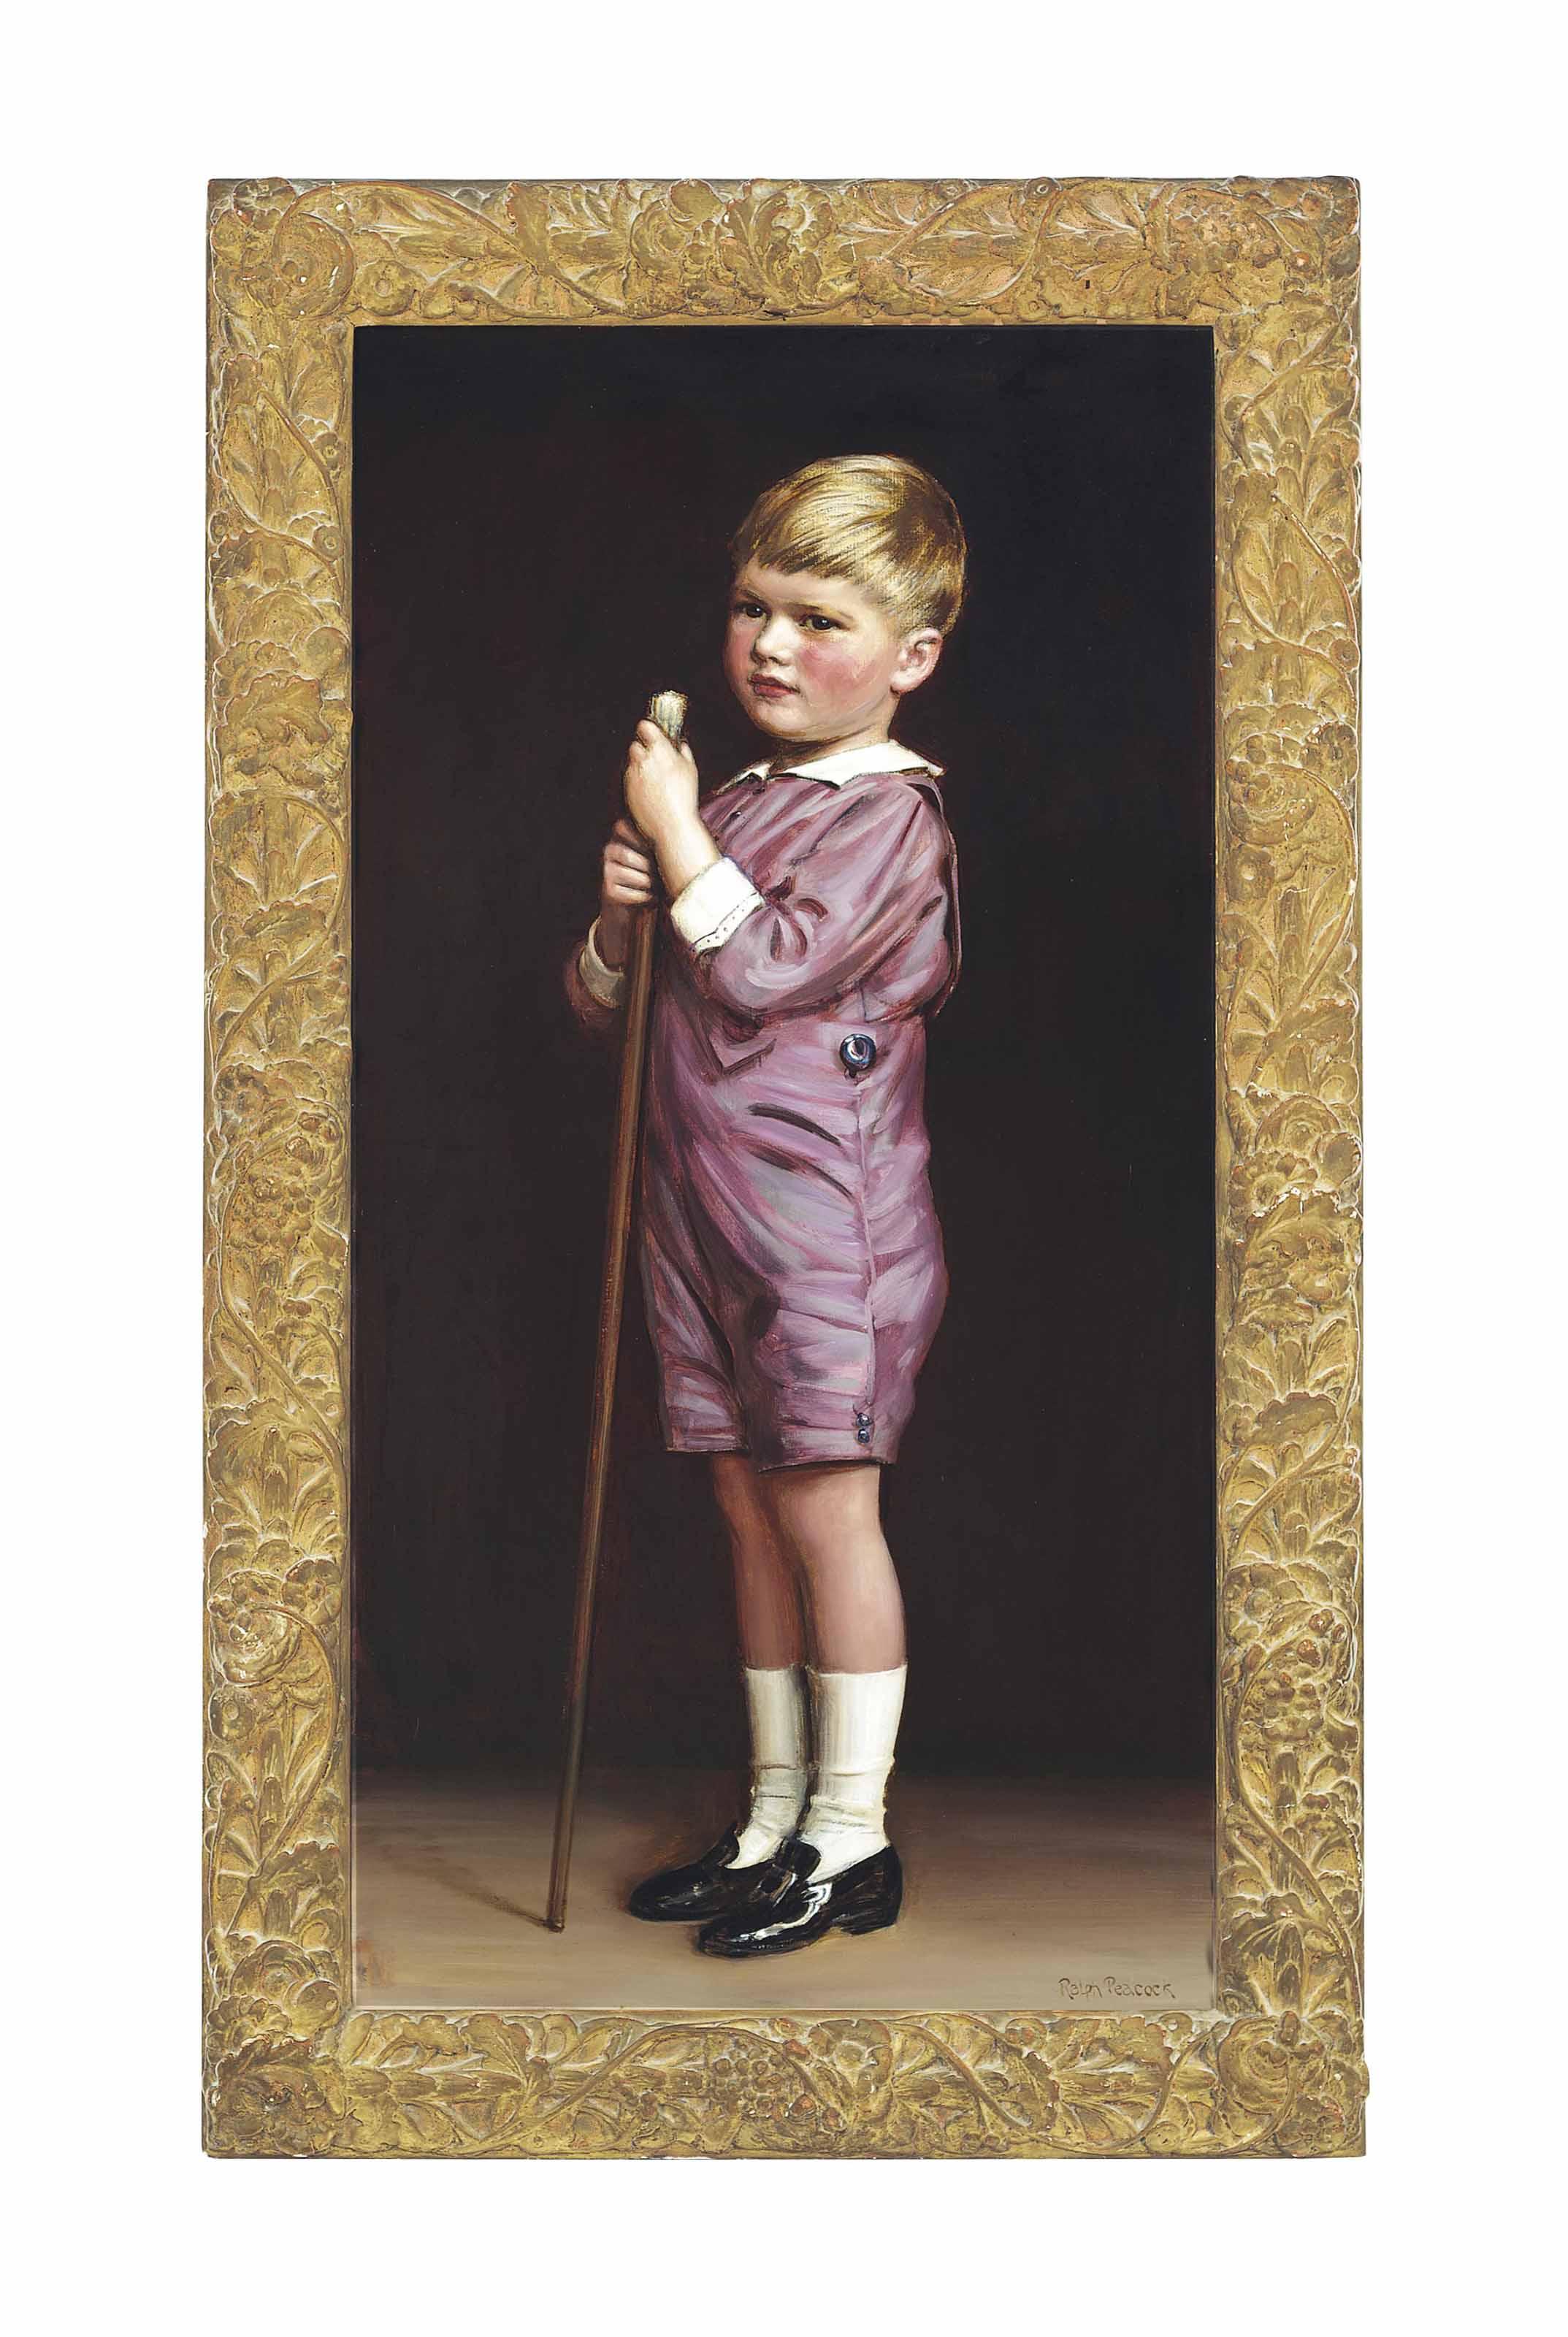 Portrait of George Michael Kerr (b. 1913)